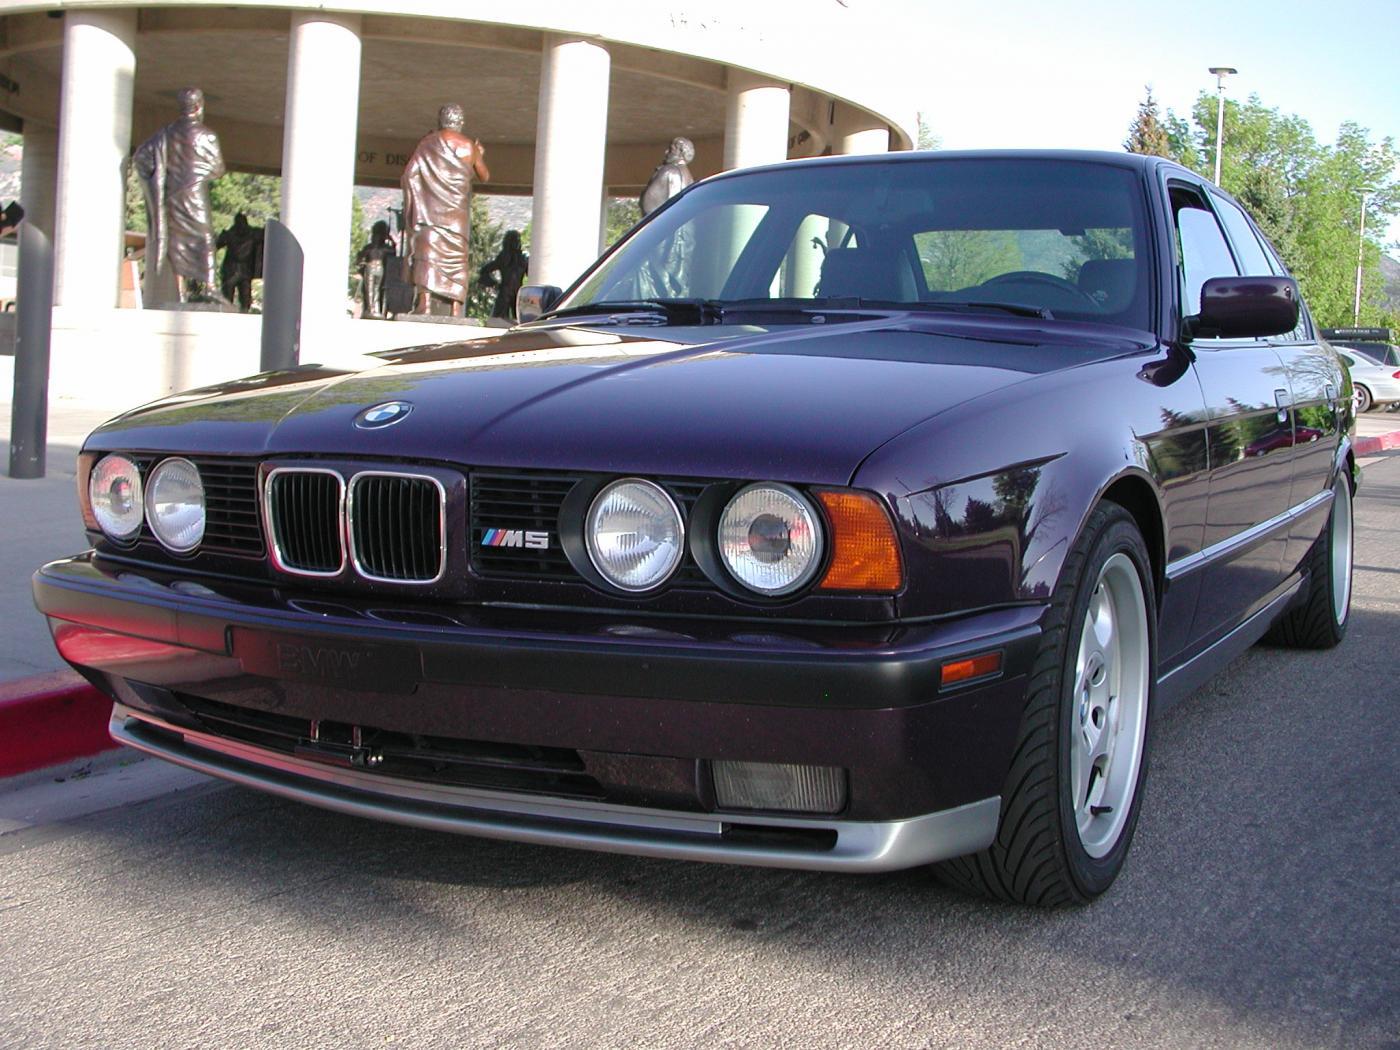 BMW-M5-E34--.jpeg